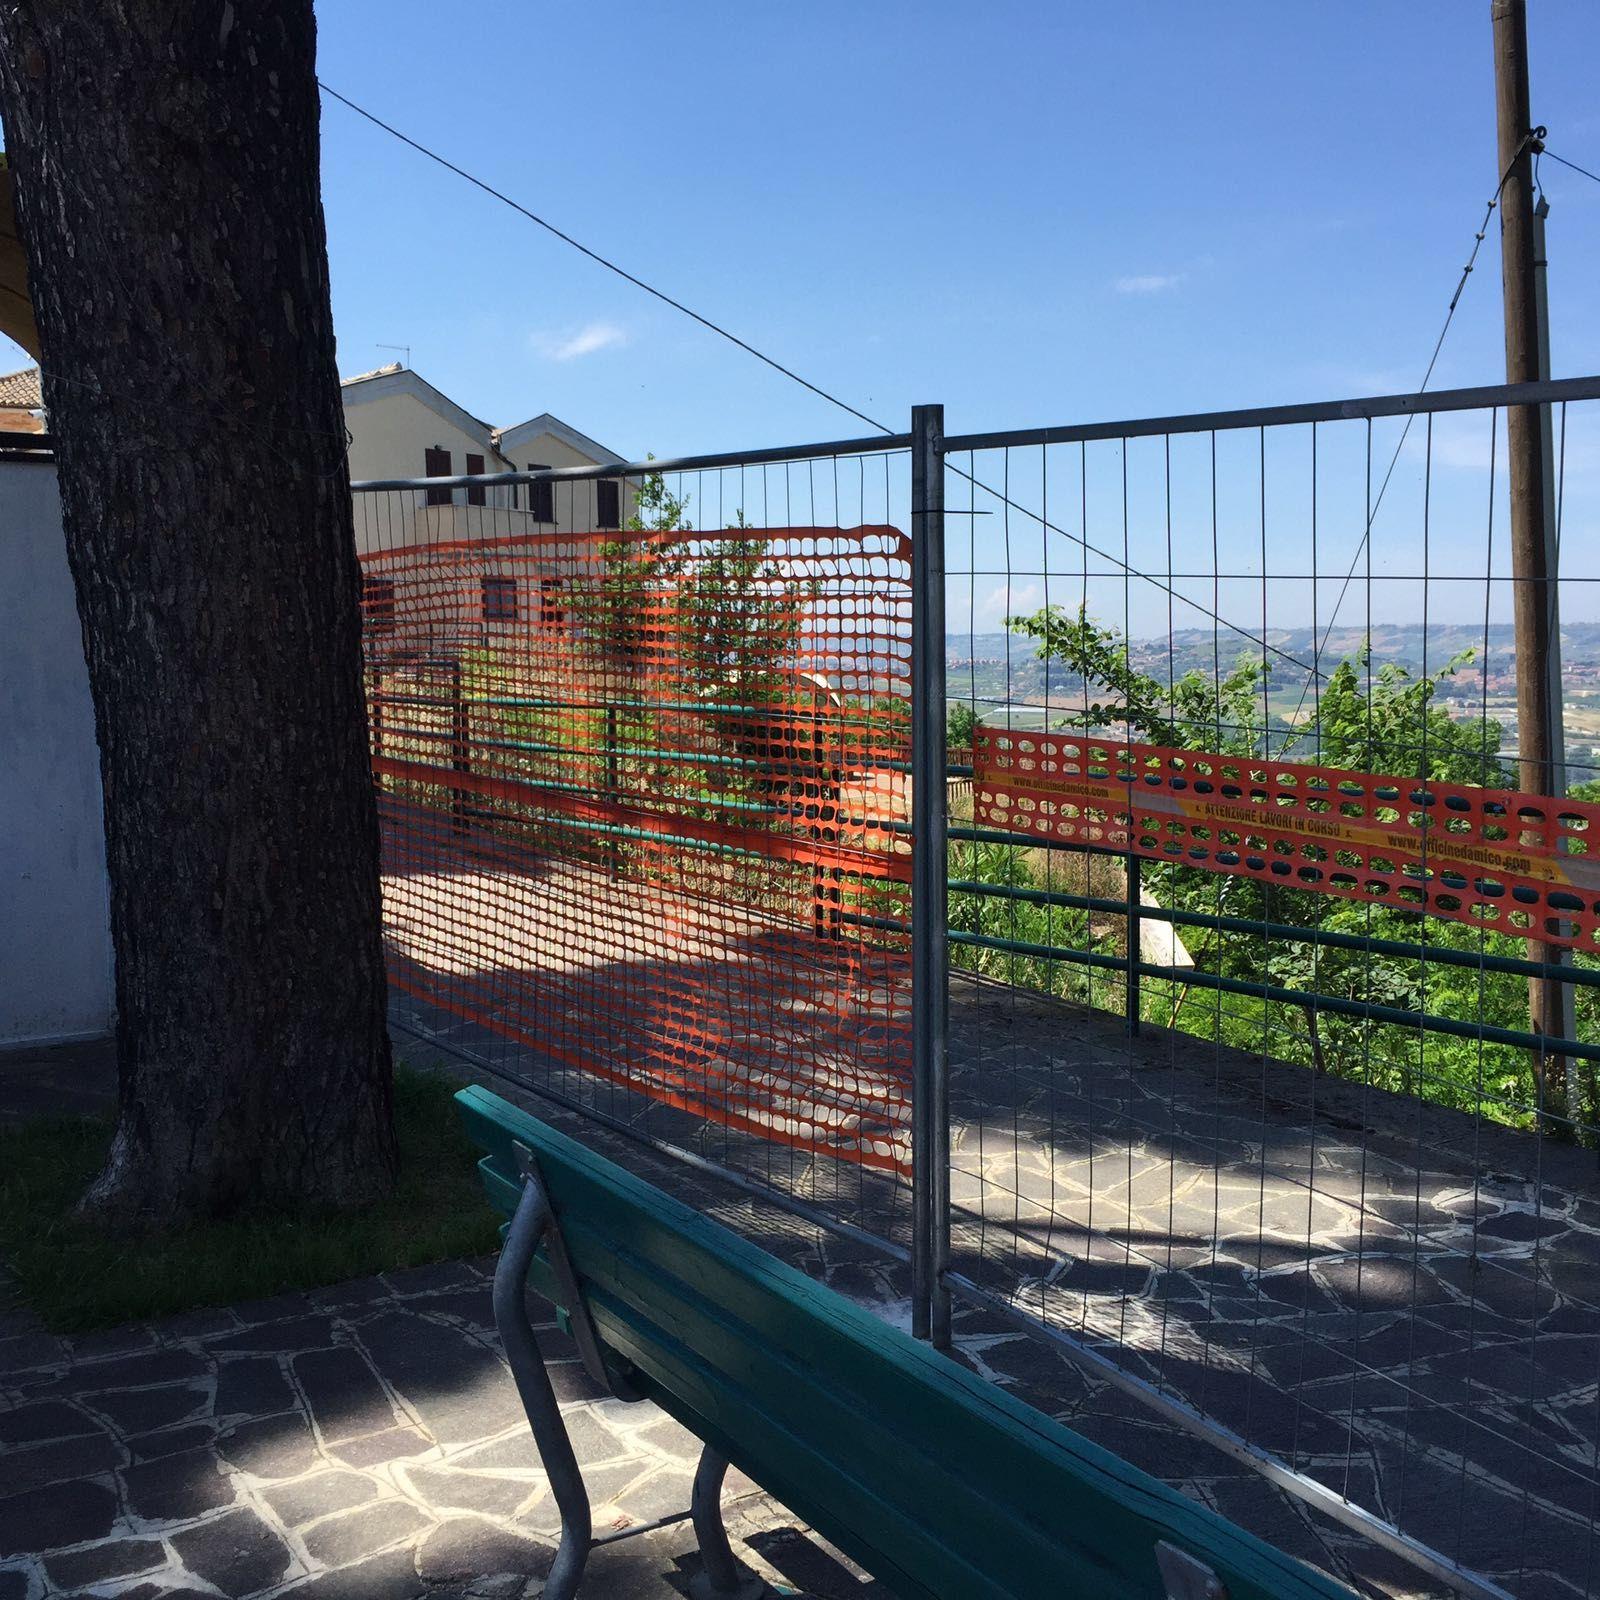 Montesilvano colle: rischio frana, chiuso marciapiede